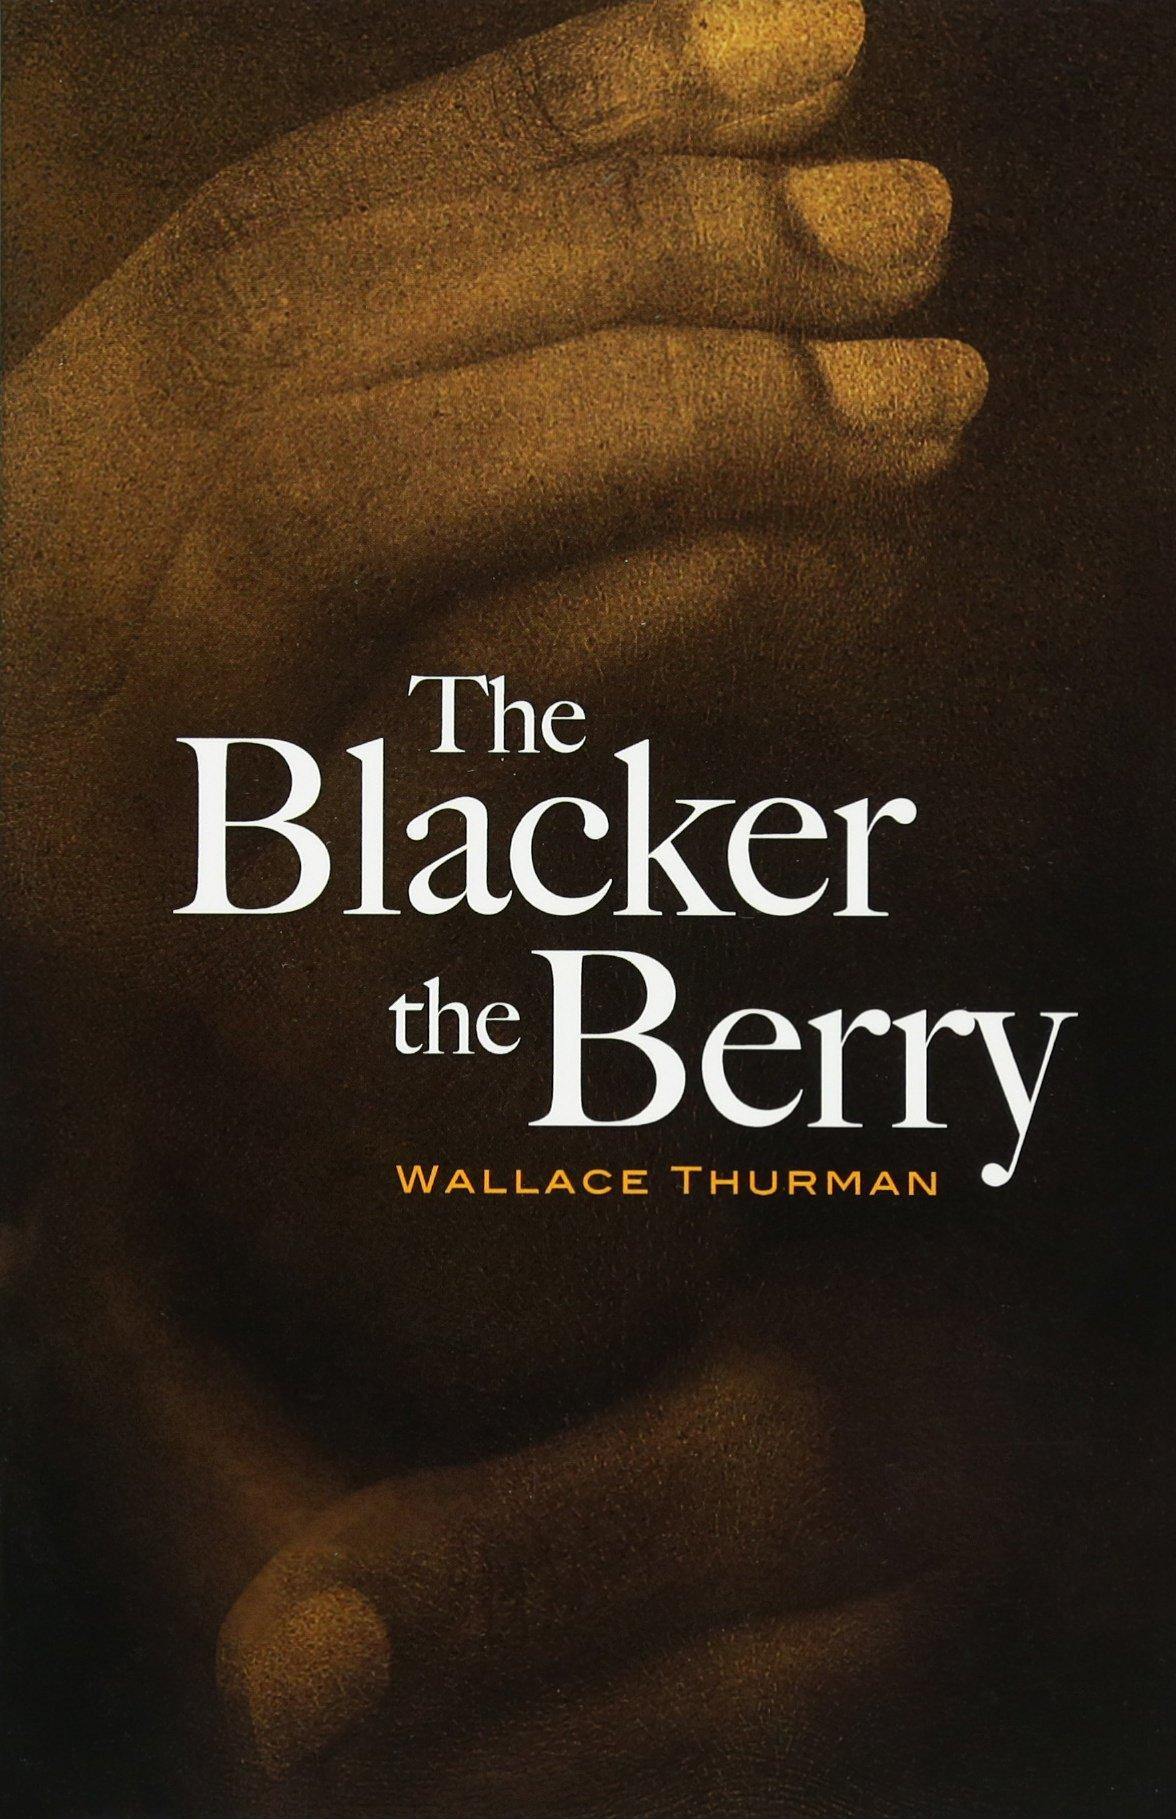 Download The Blacker the Berry (Dover Books on Literature & Drama) pdf